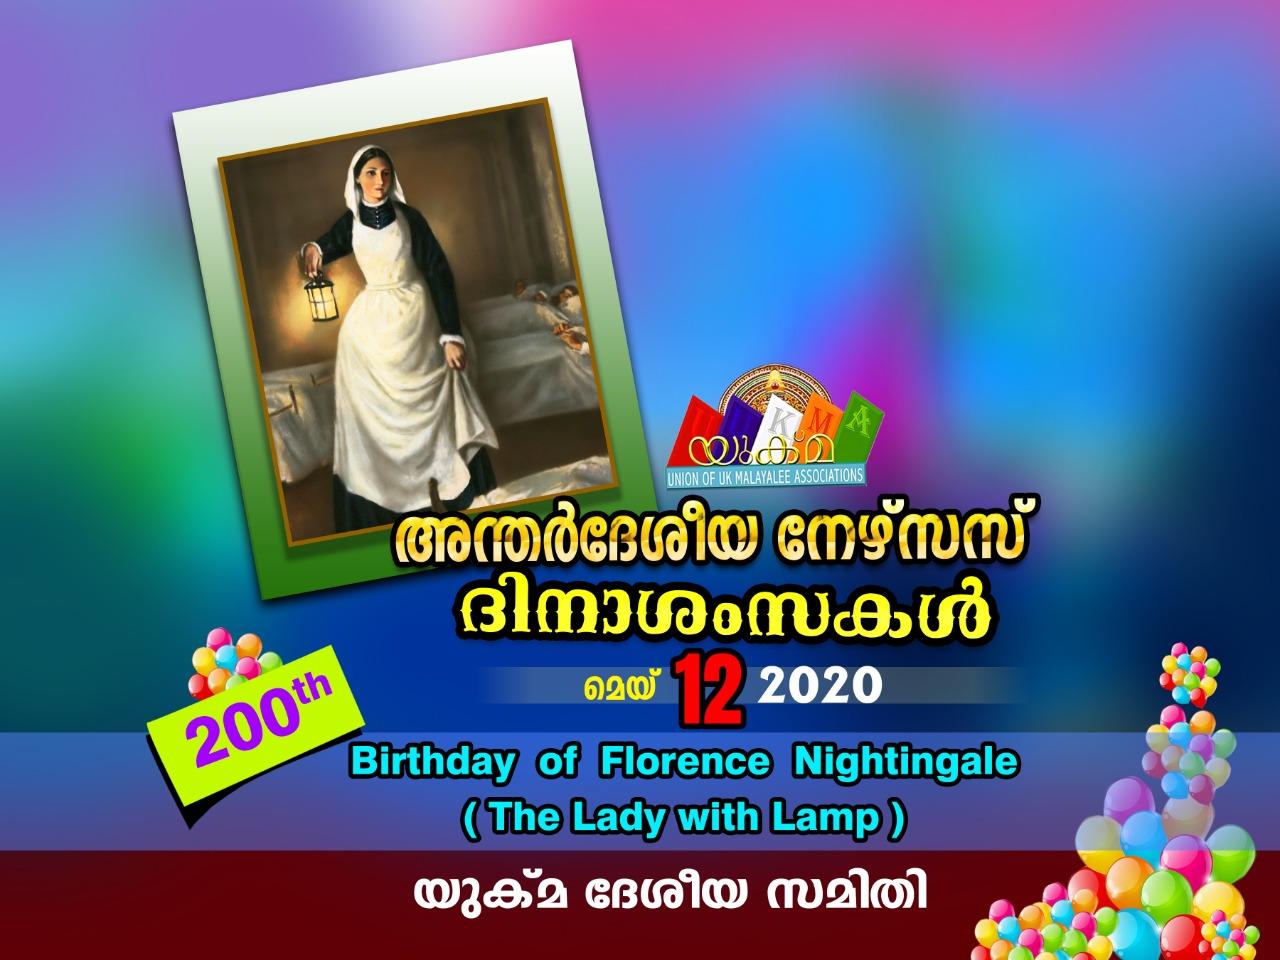 https://uukmanews.com/florenceightingale-birthday-internationalnursesday120520/